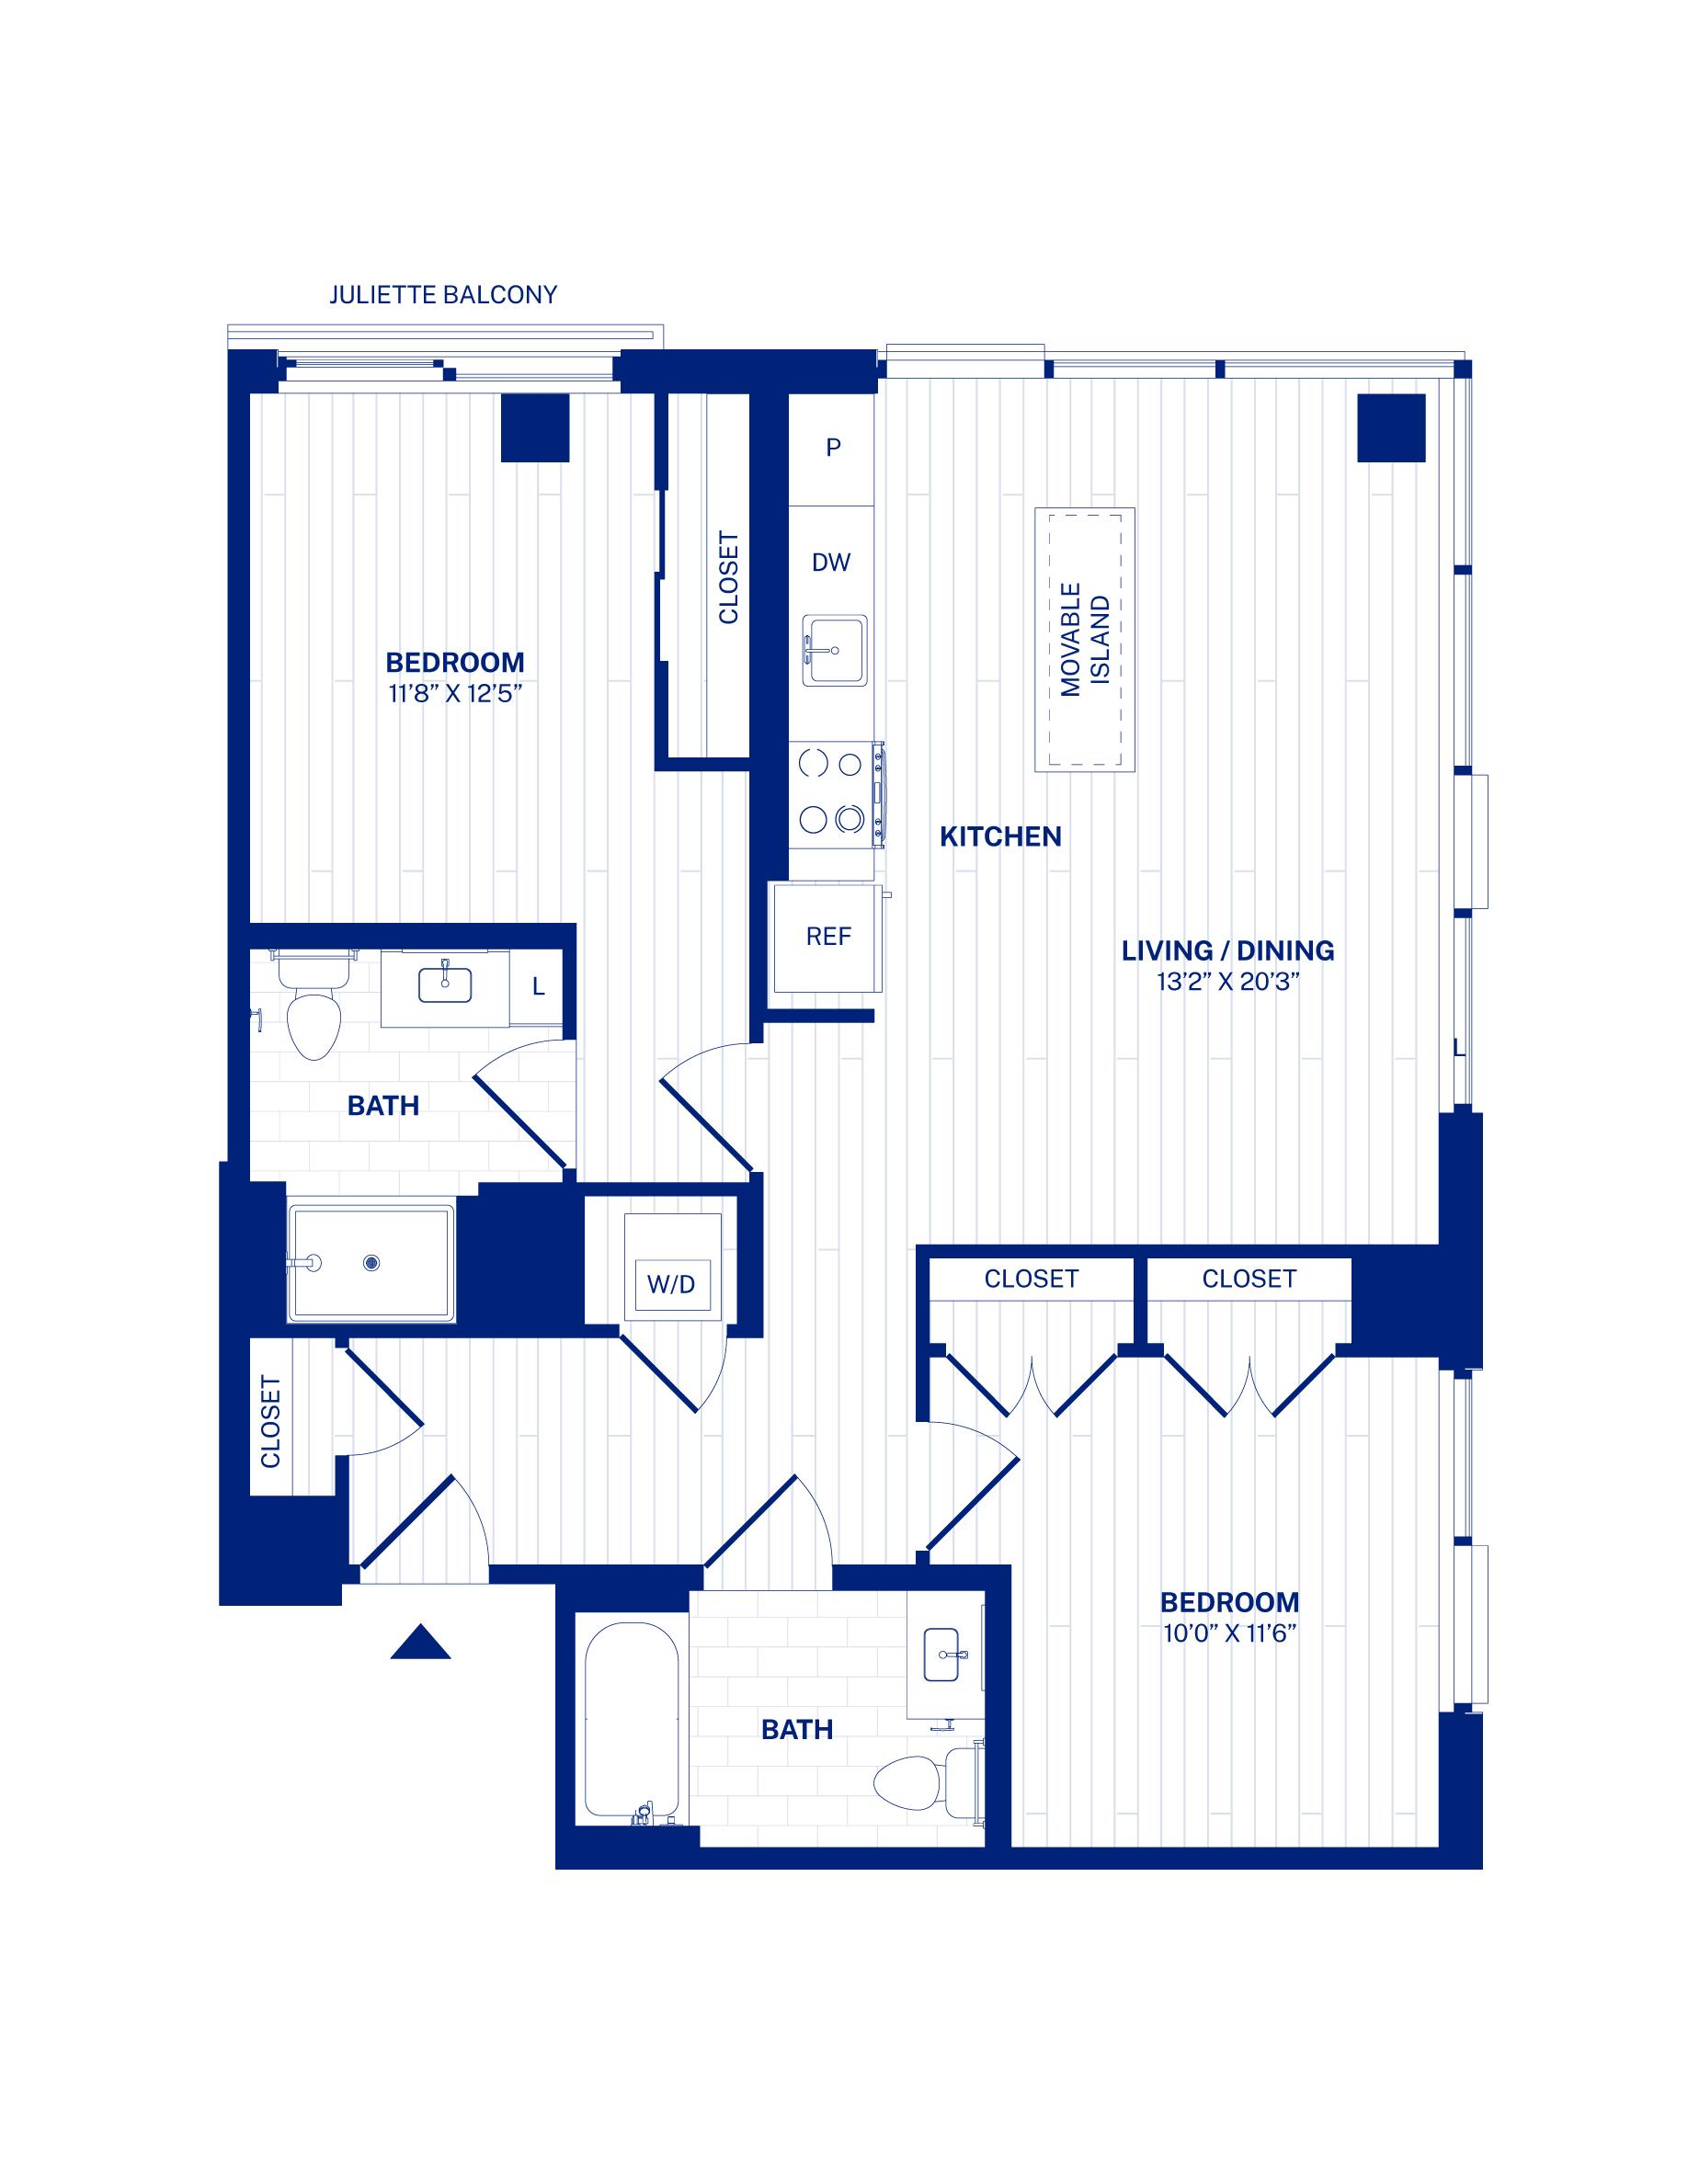 Residence 619 thumb